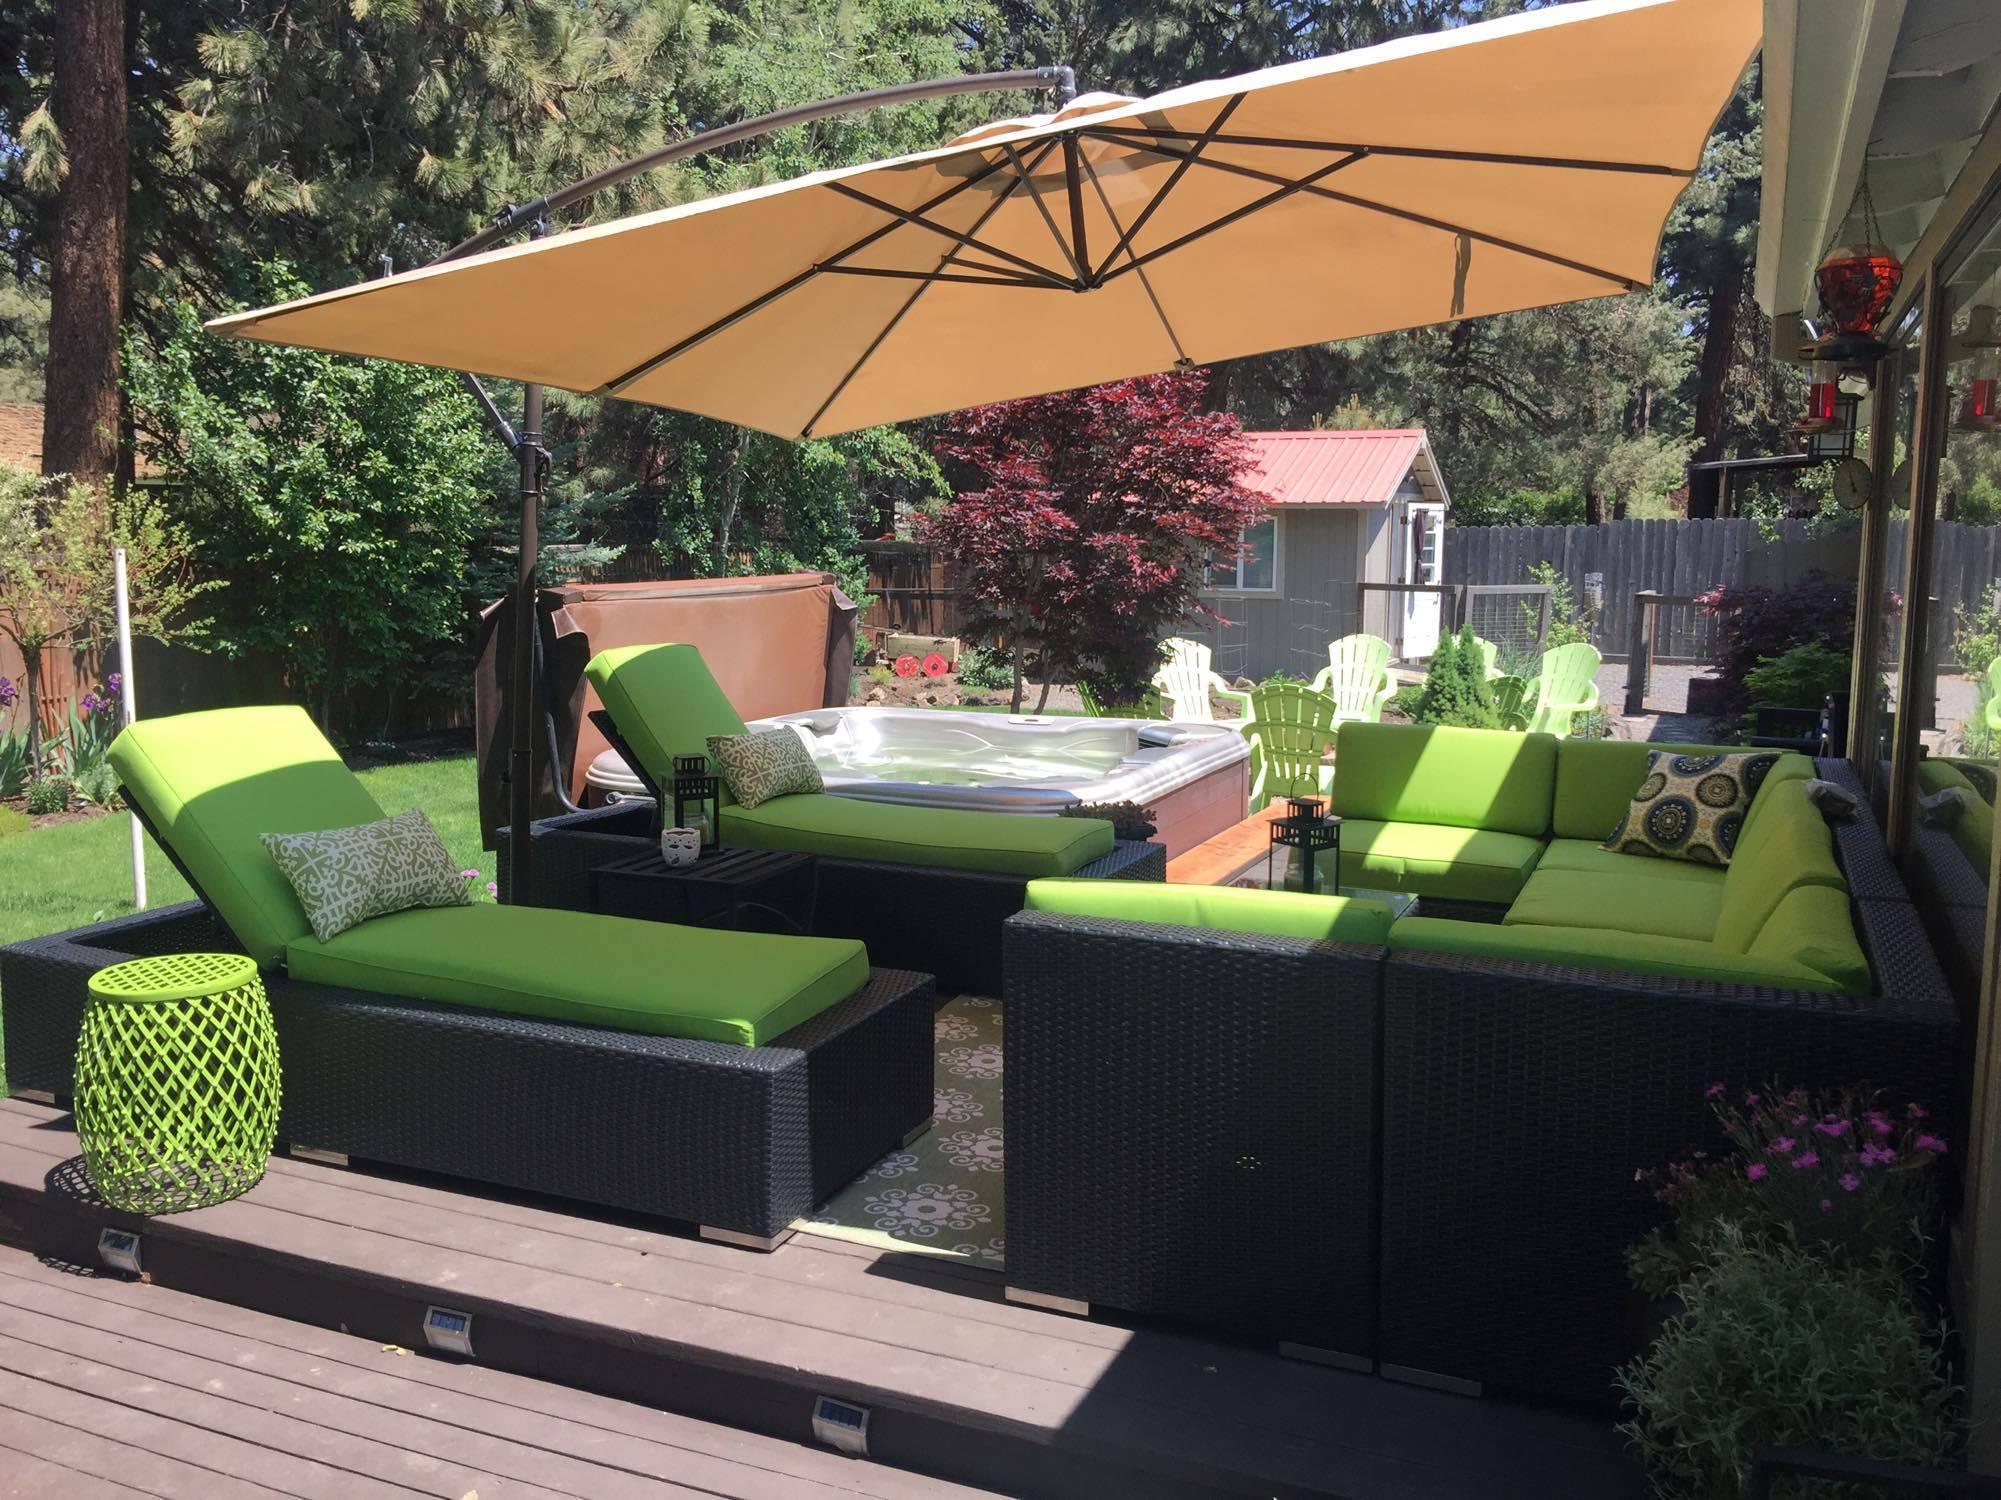 ohana-patio-furniture-outdoor-seating-set